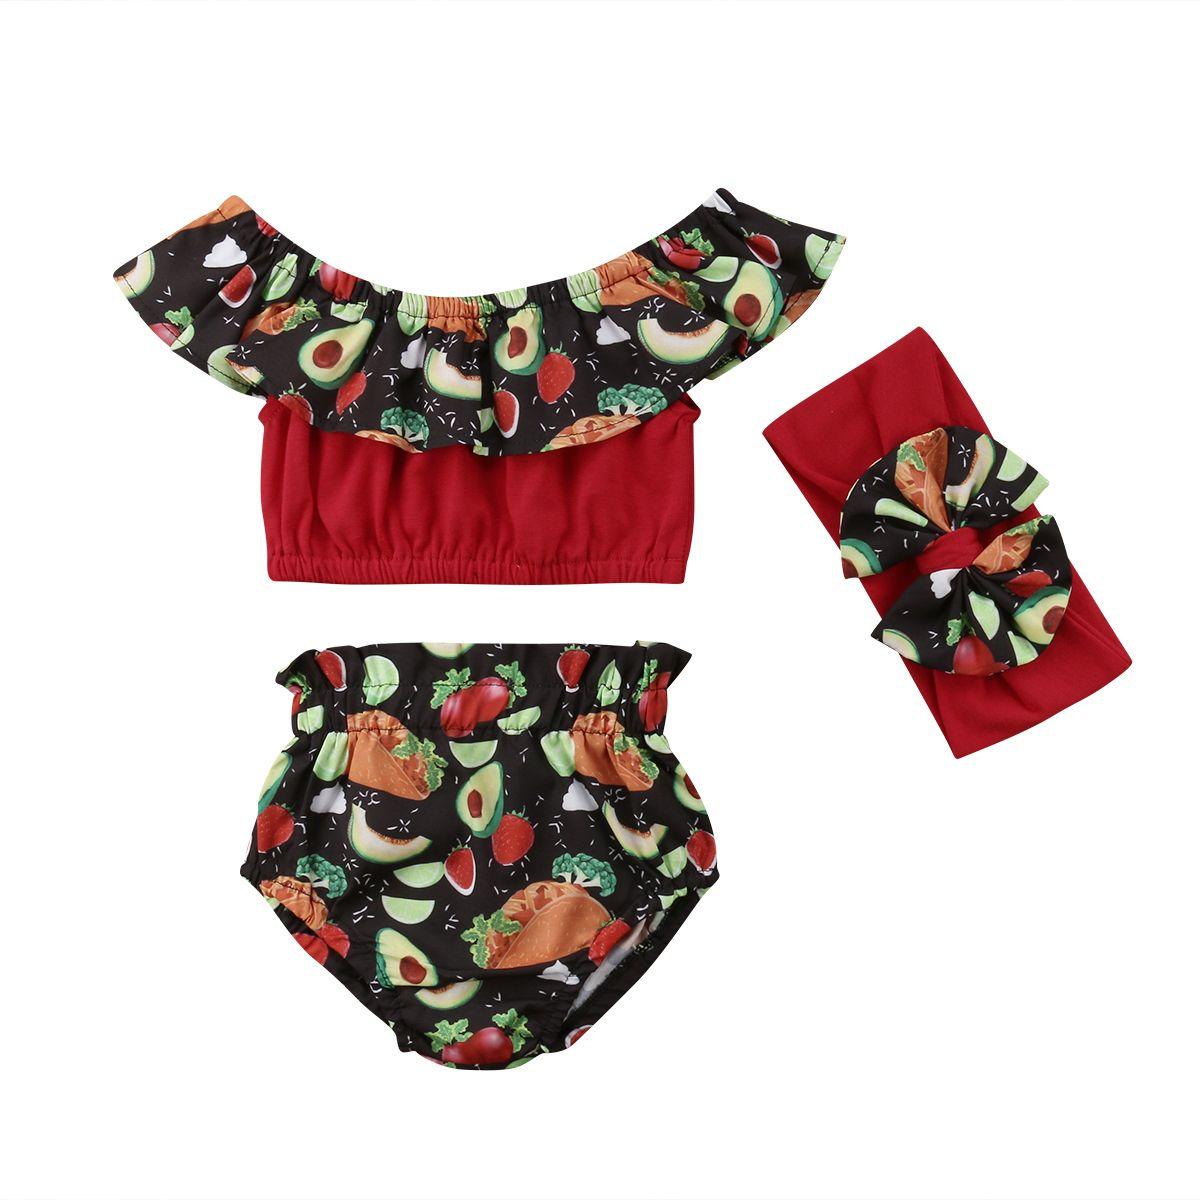 3PCS roupa Set Criança Baby Kids Meninas Alças Fruit Floral Ruffle Cortar Tops Shorts alça Outfits roupas Set